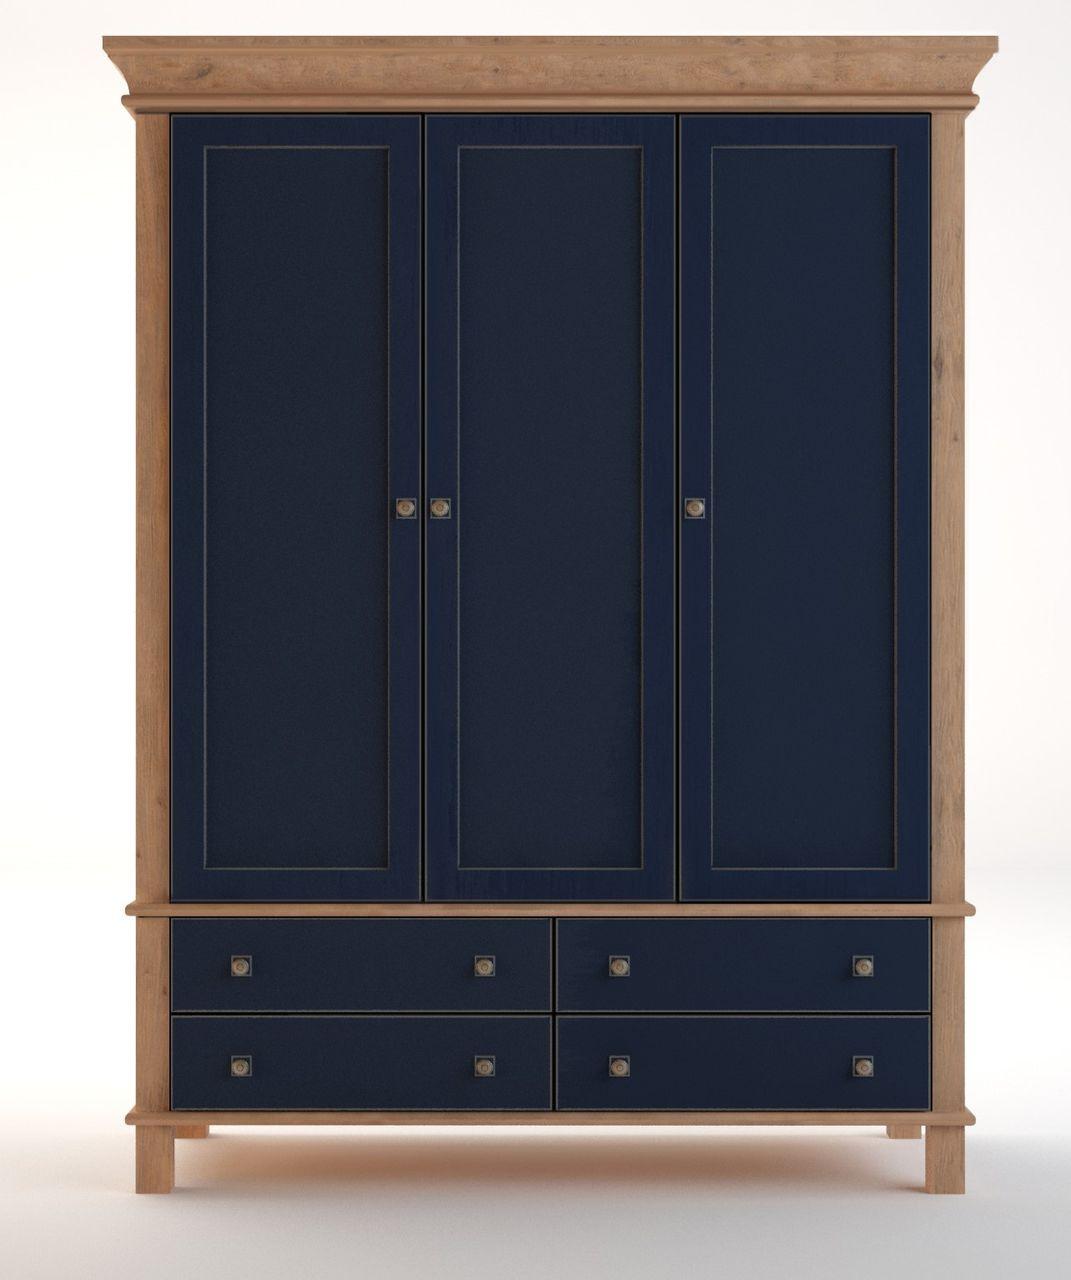 Синий деревянный трёхстворчатый шкаф